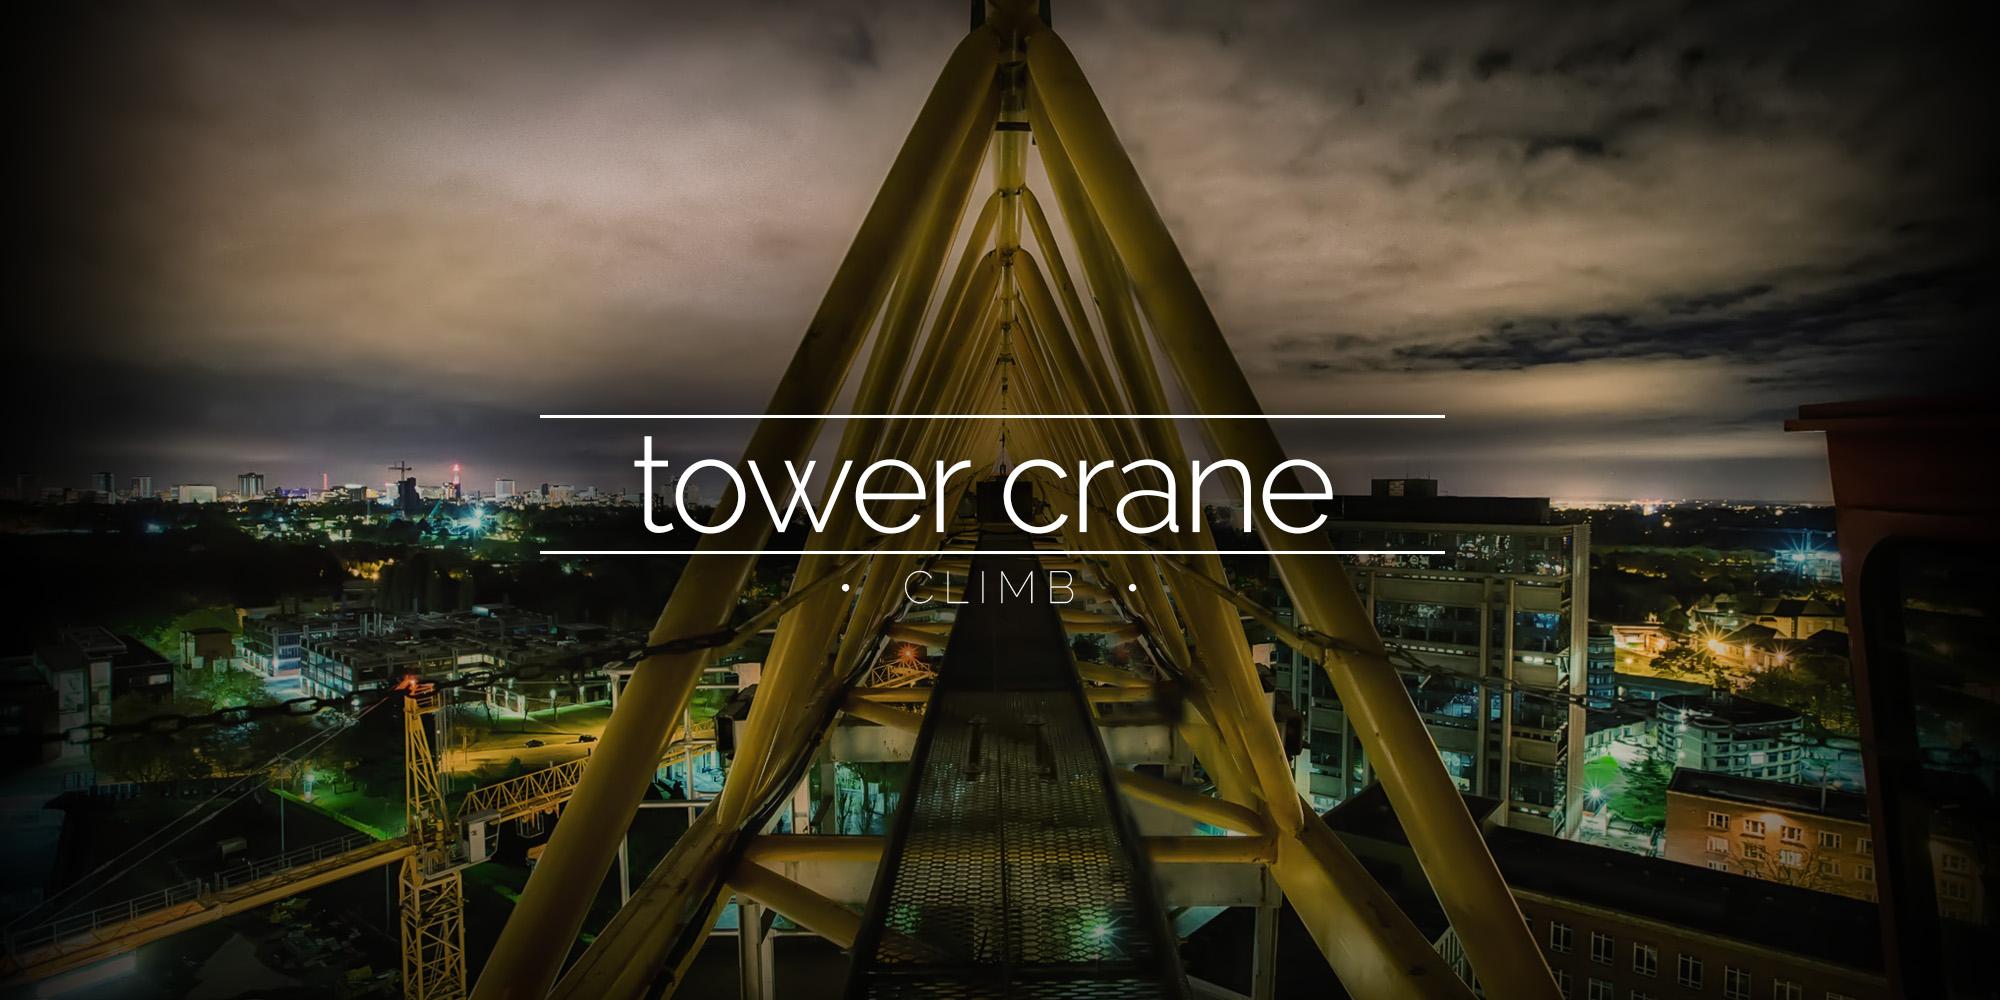 Climbing A Tower Crane